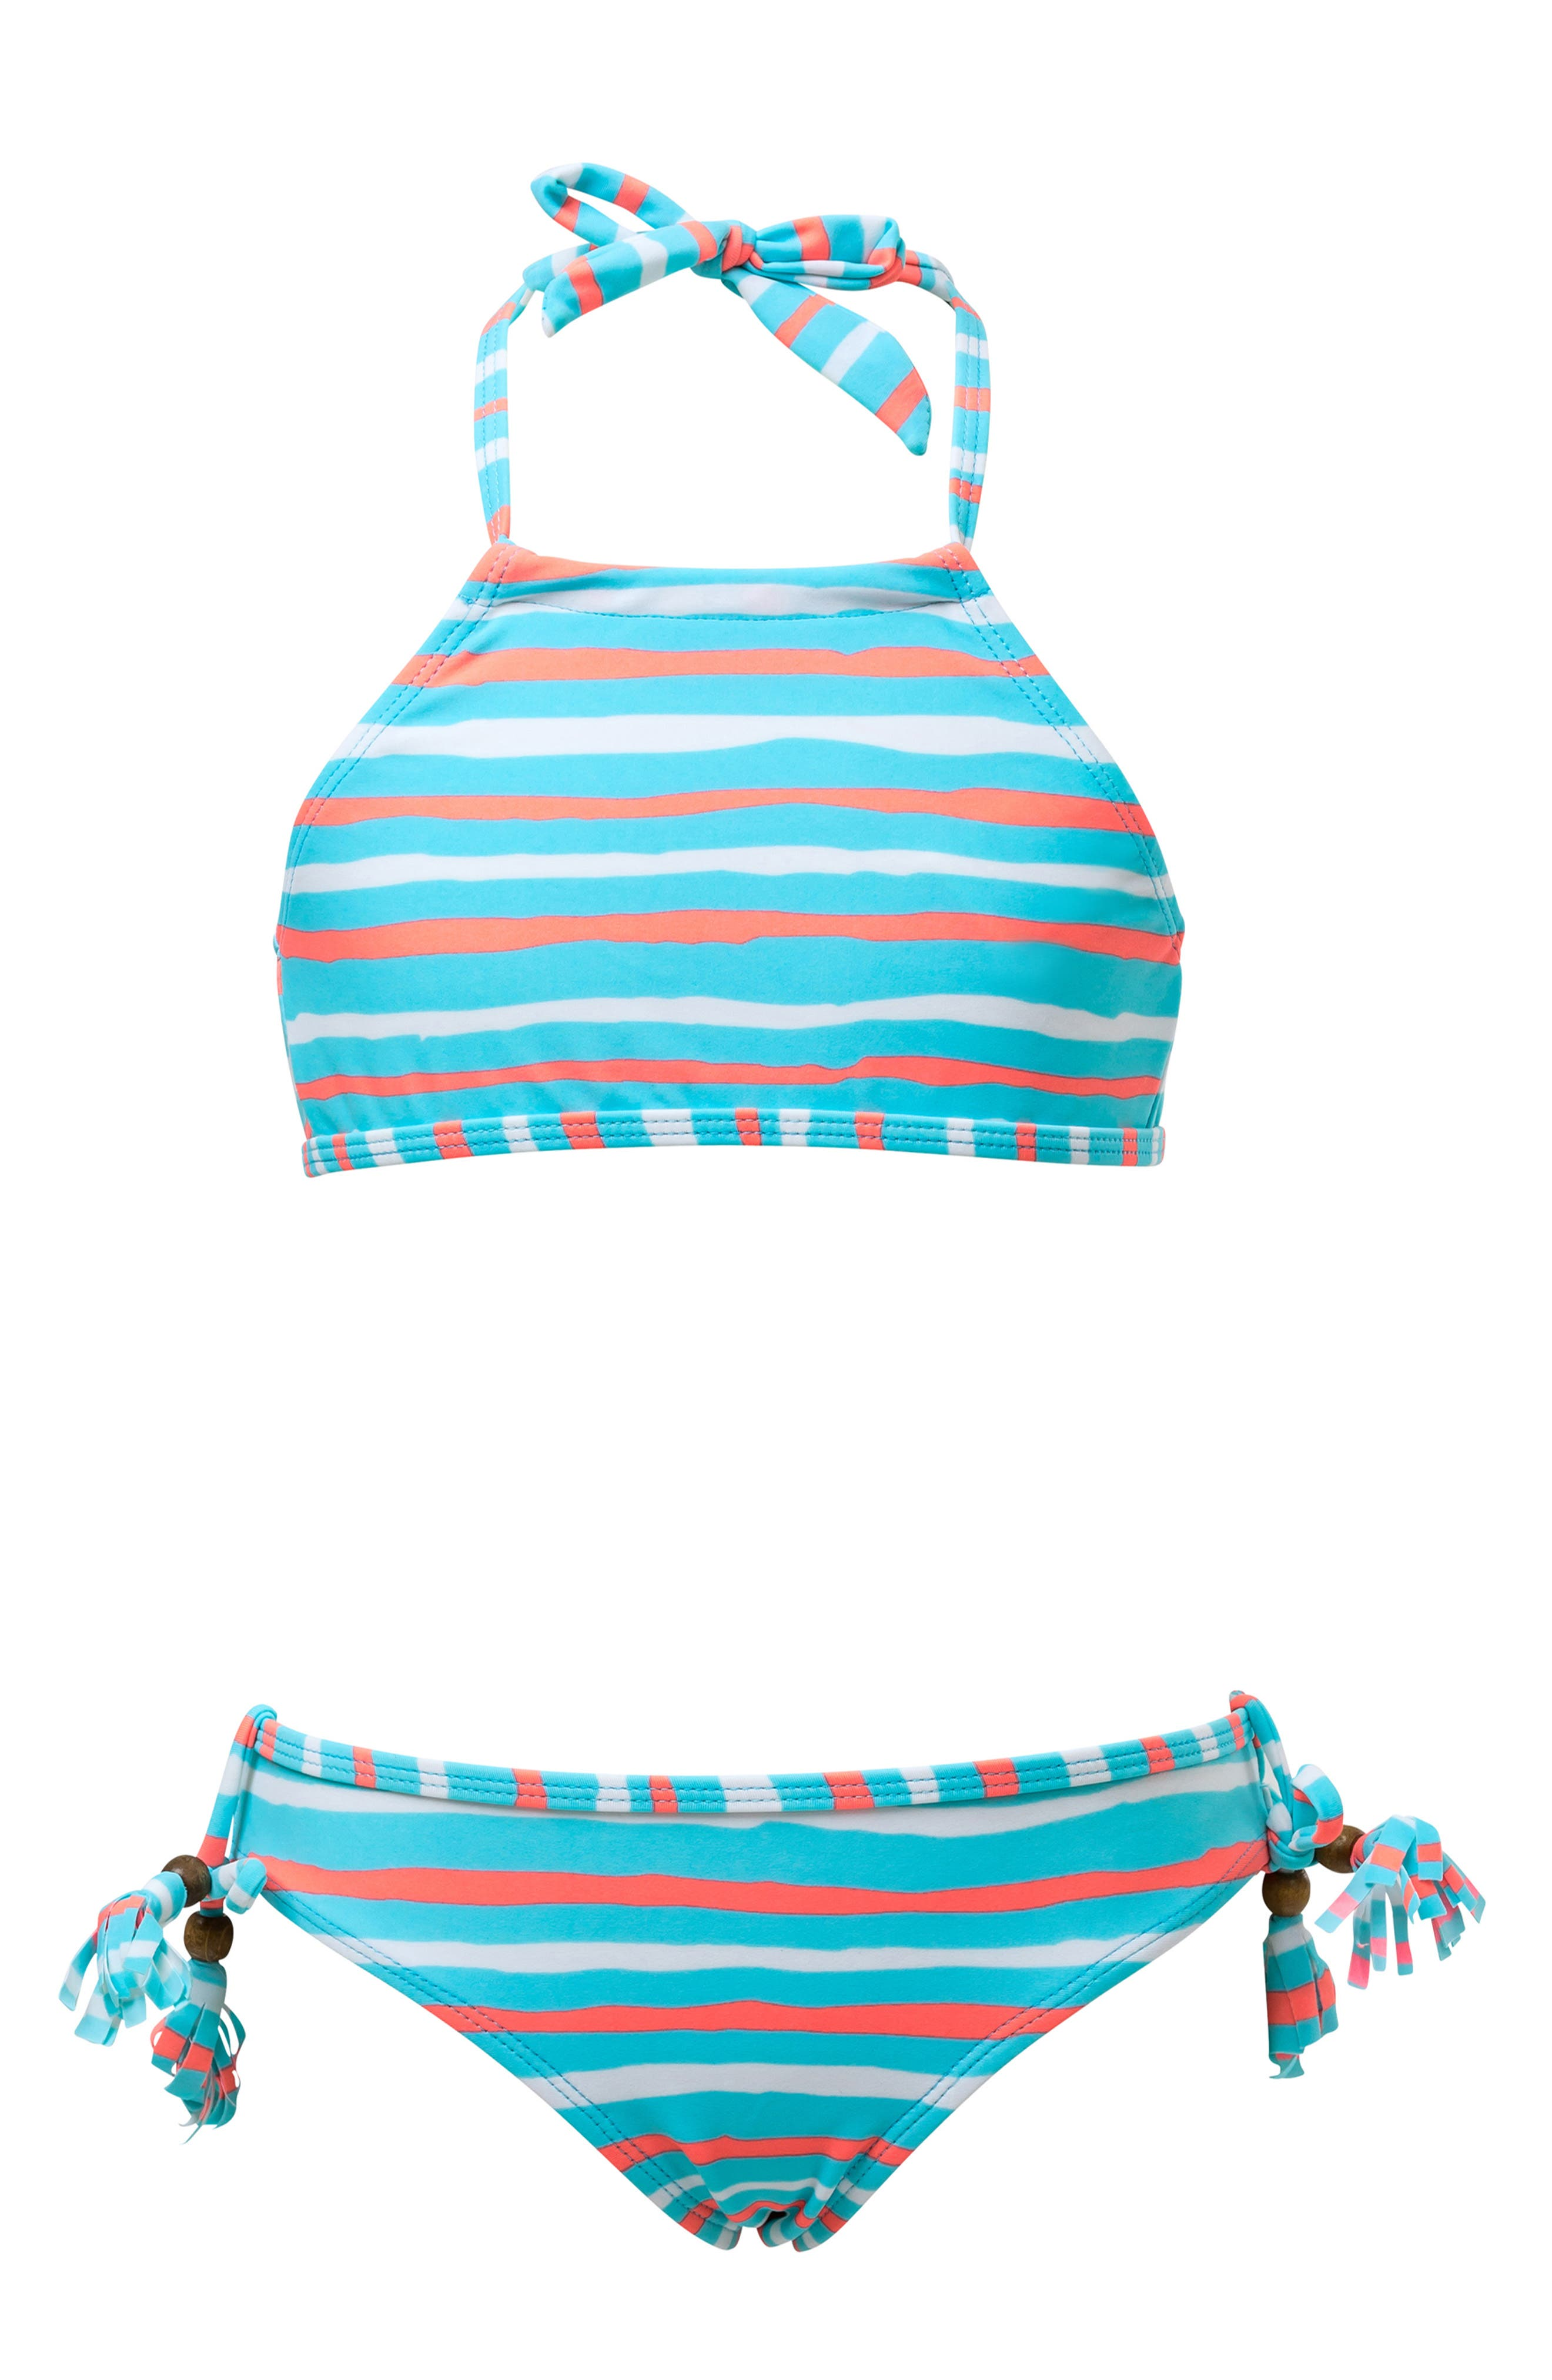 SNAPPER ROCK Stripe Two-Piece Halter Swimsuit, Main, color, NEON LIGHT BLUE